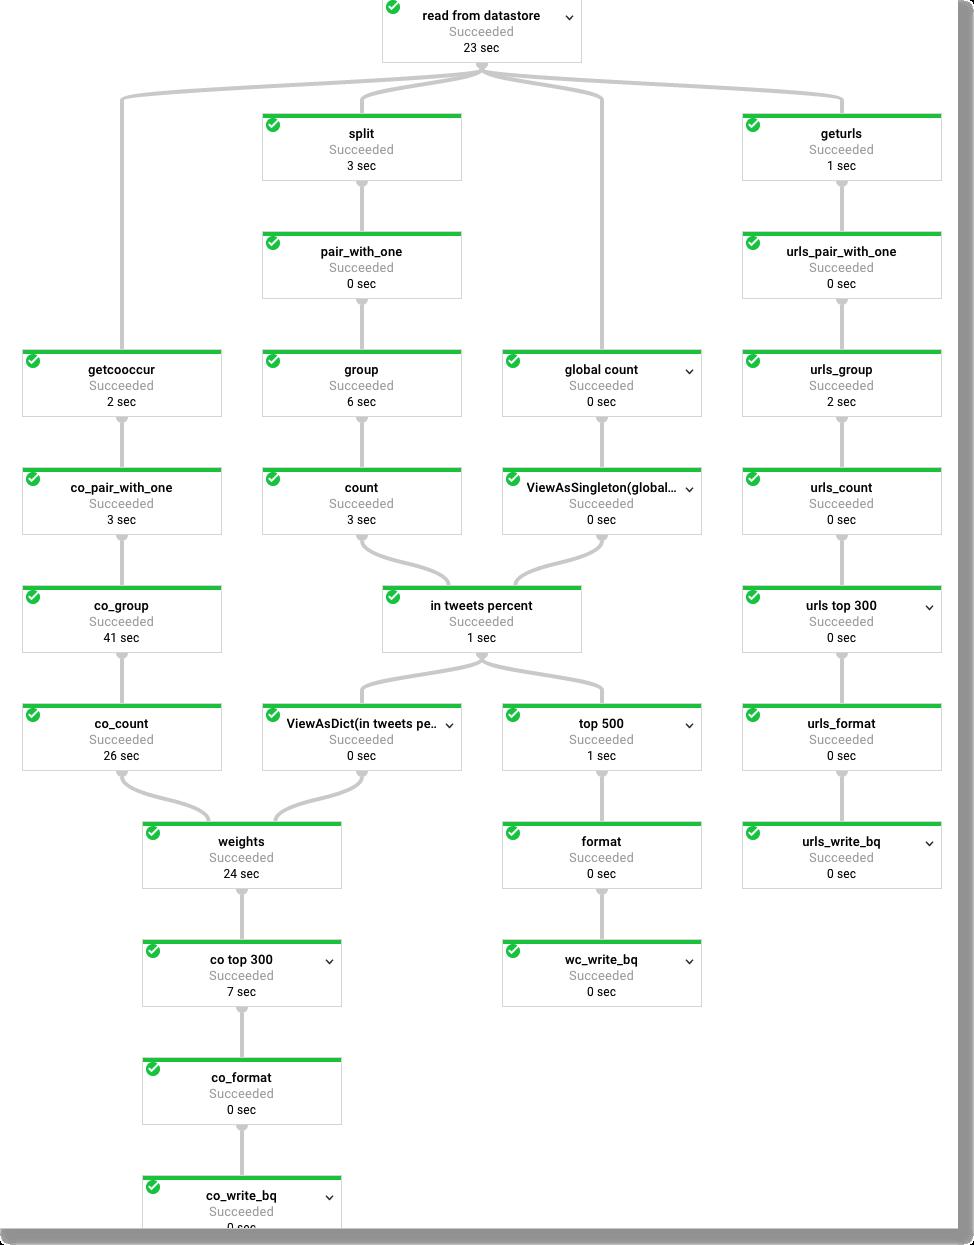 gae-dataflow/README md at master · amygdala/gae-dataflow · GitHub